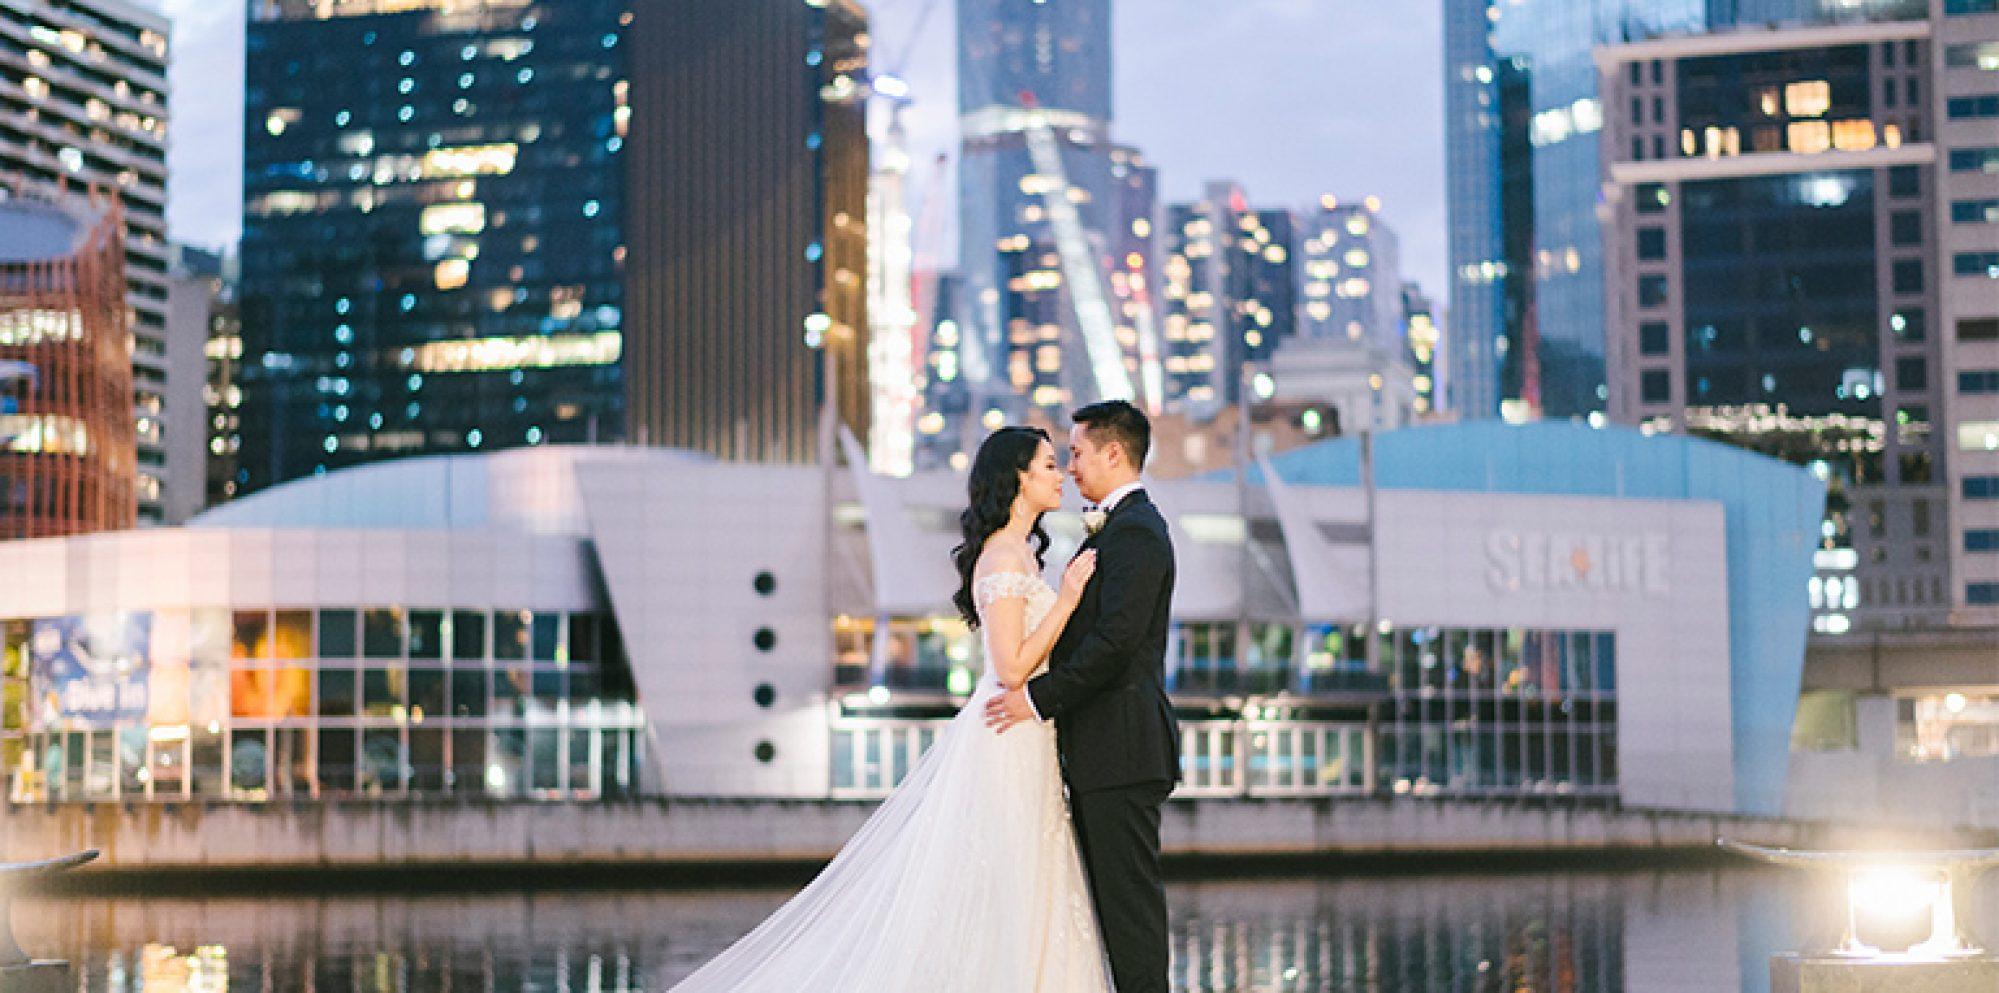 Liz & anh wedding photography @ crown aviary